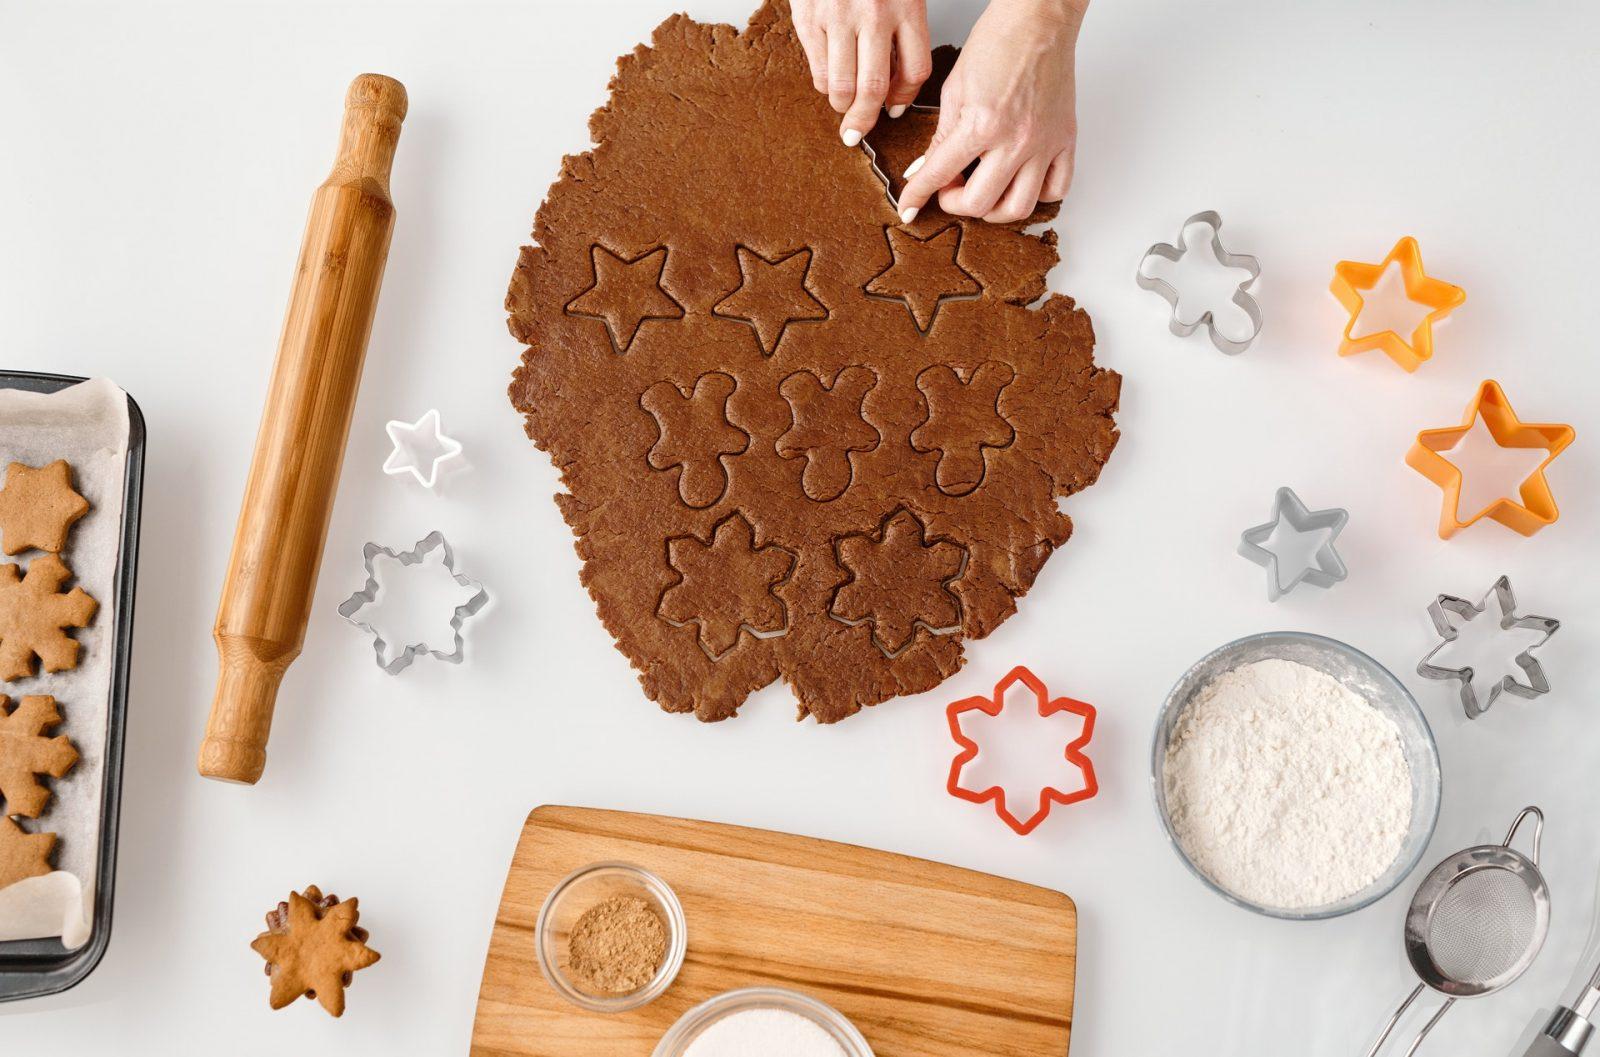 WordPress Website Design That's Not Cookie Cutter Looks